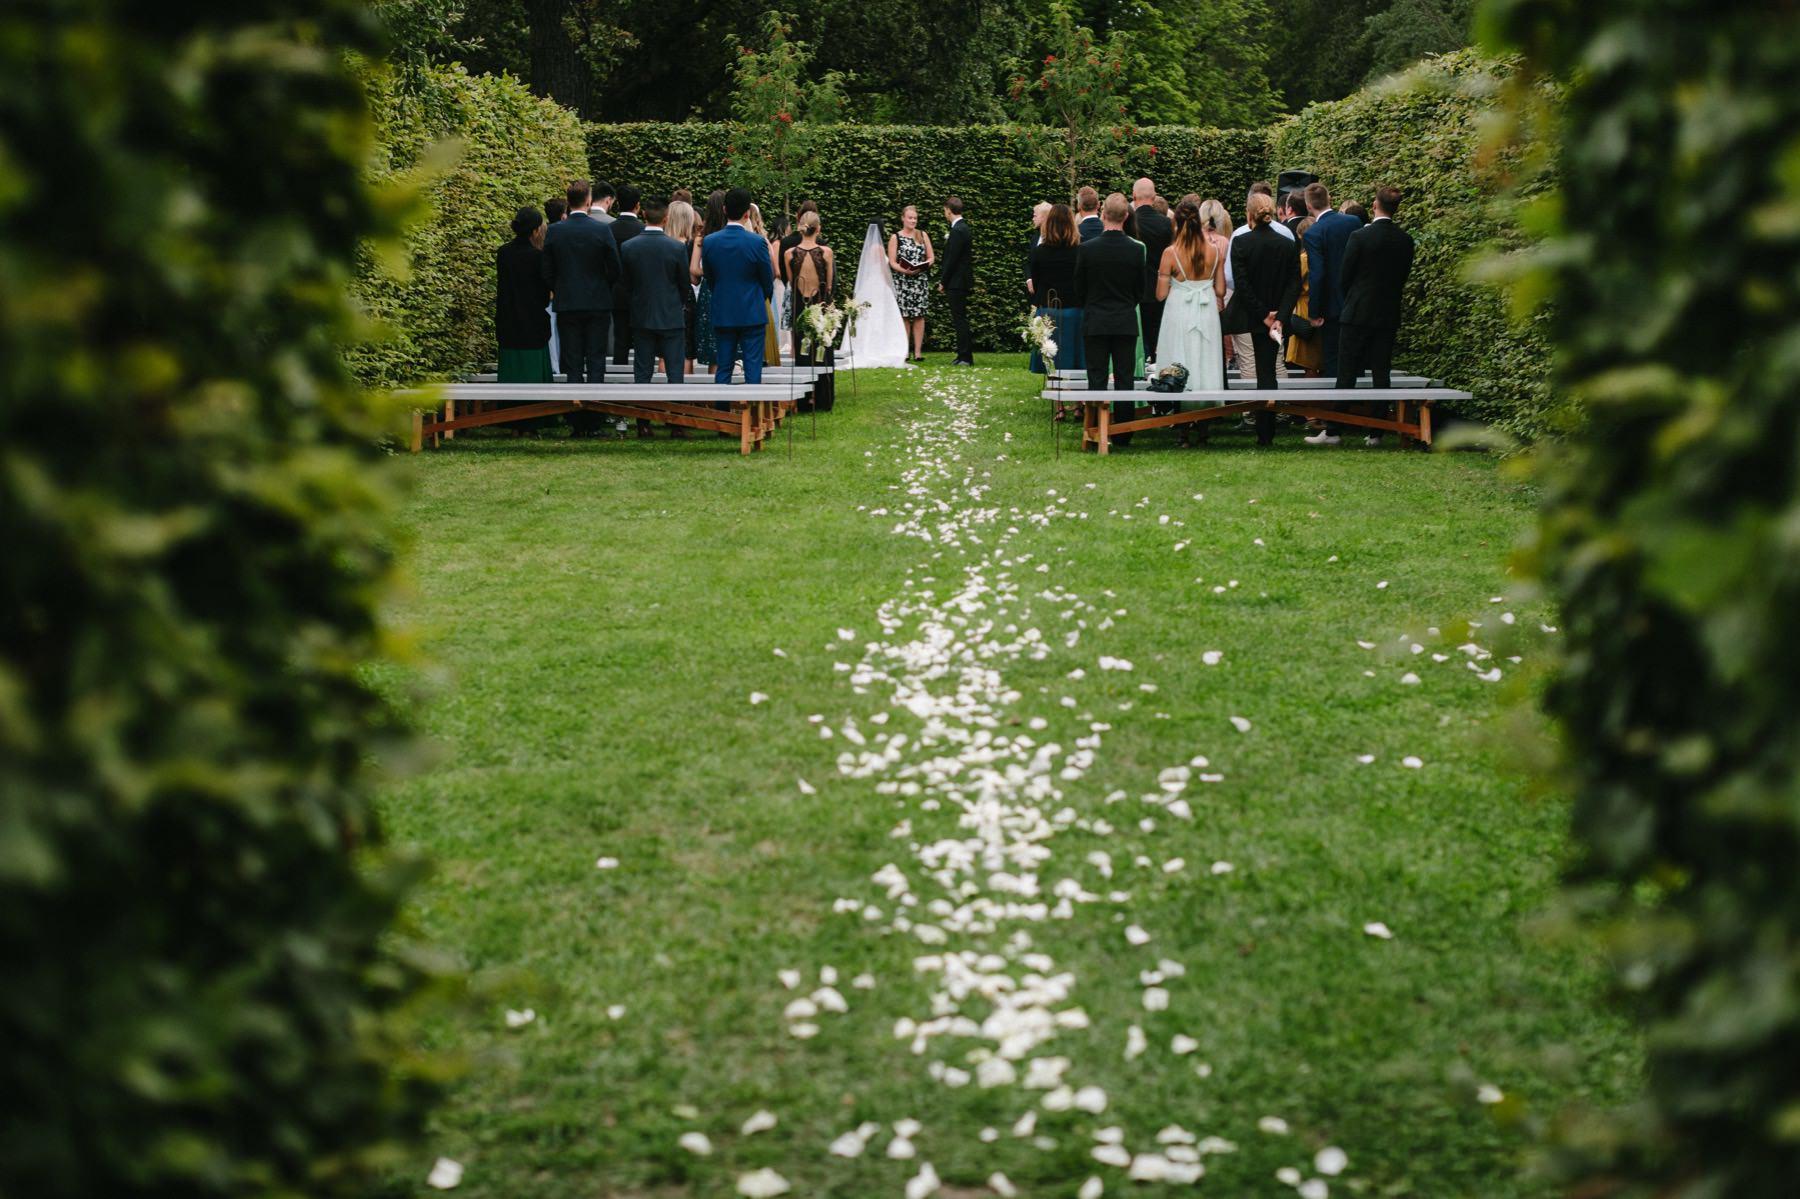 Rosendals Trädgård wedding